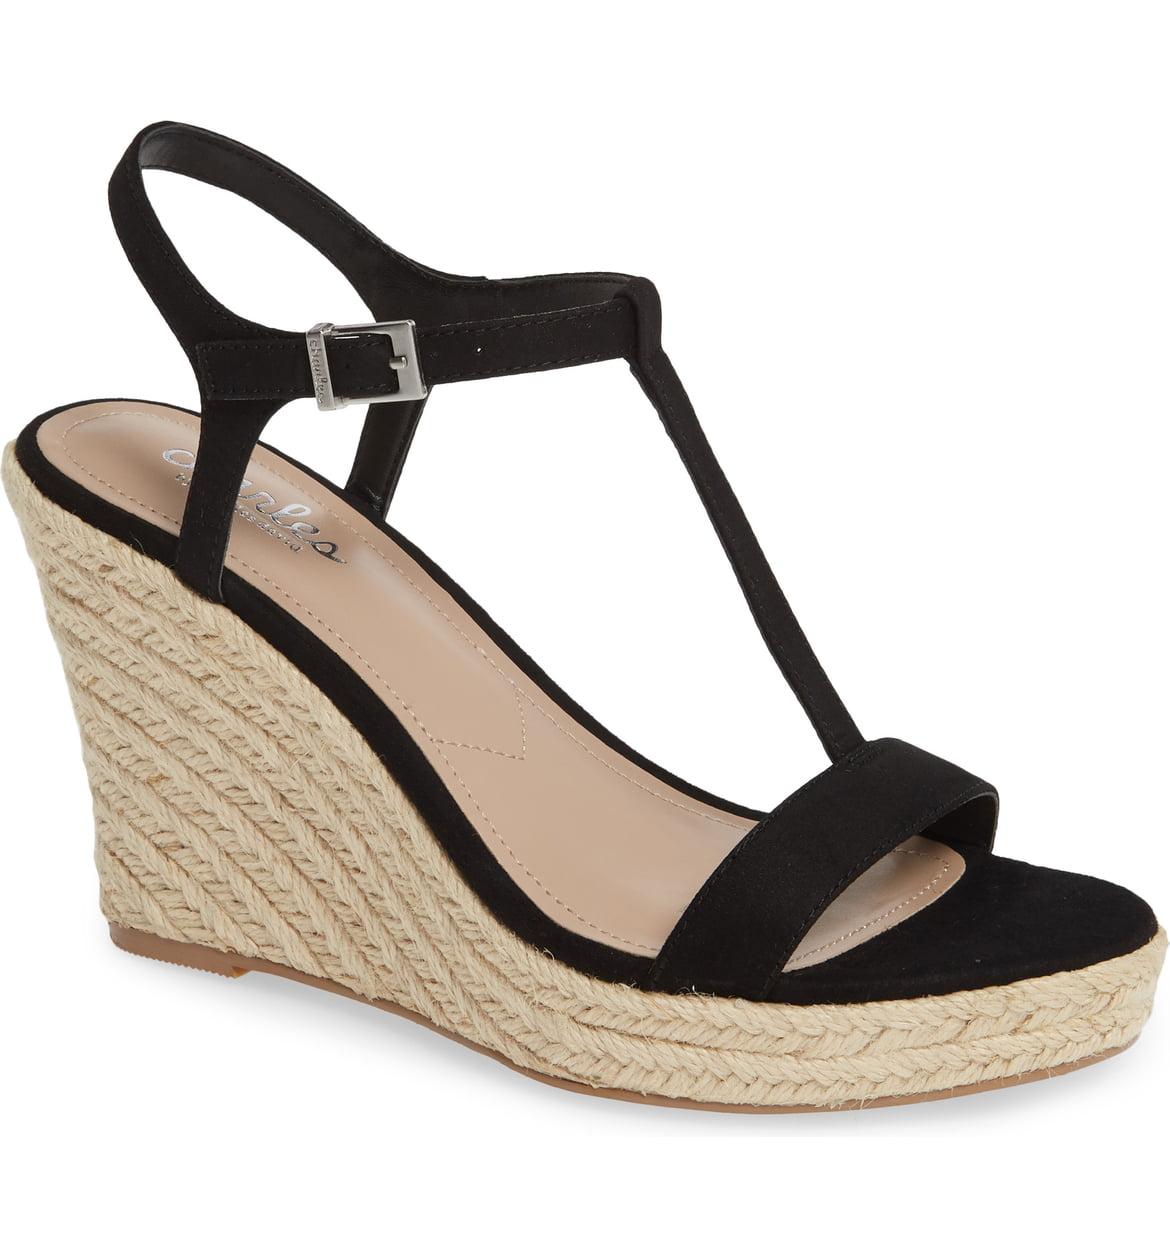 Lili T-Strap Wedge Sandal